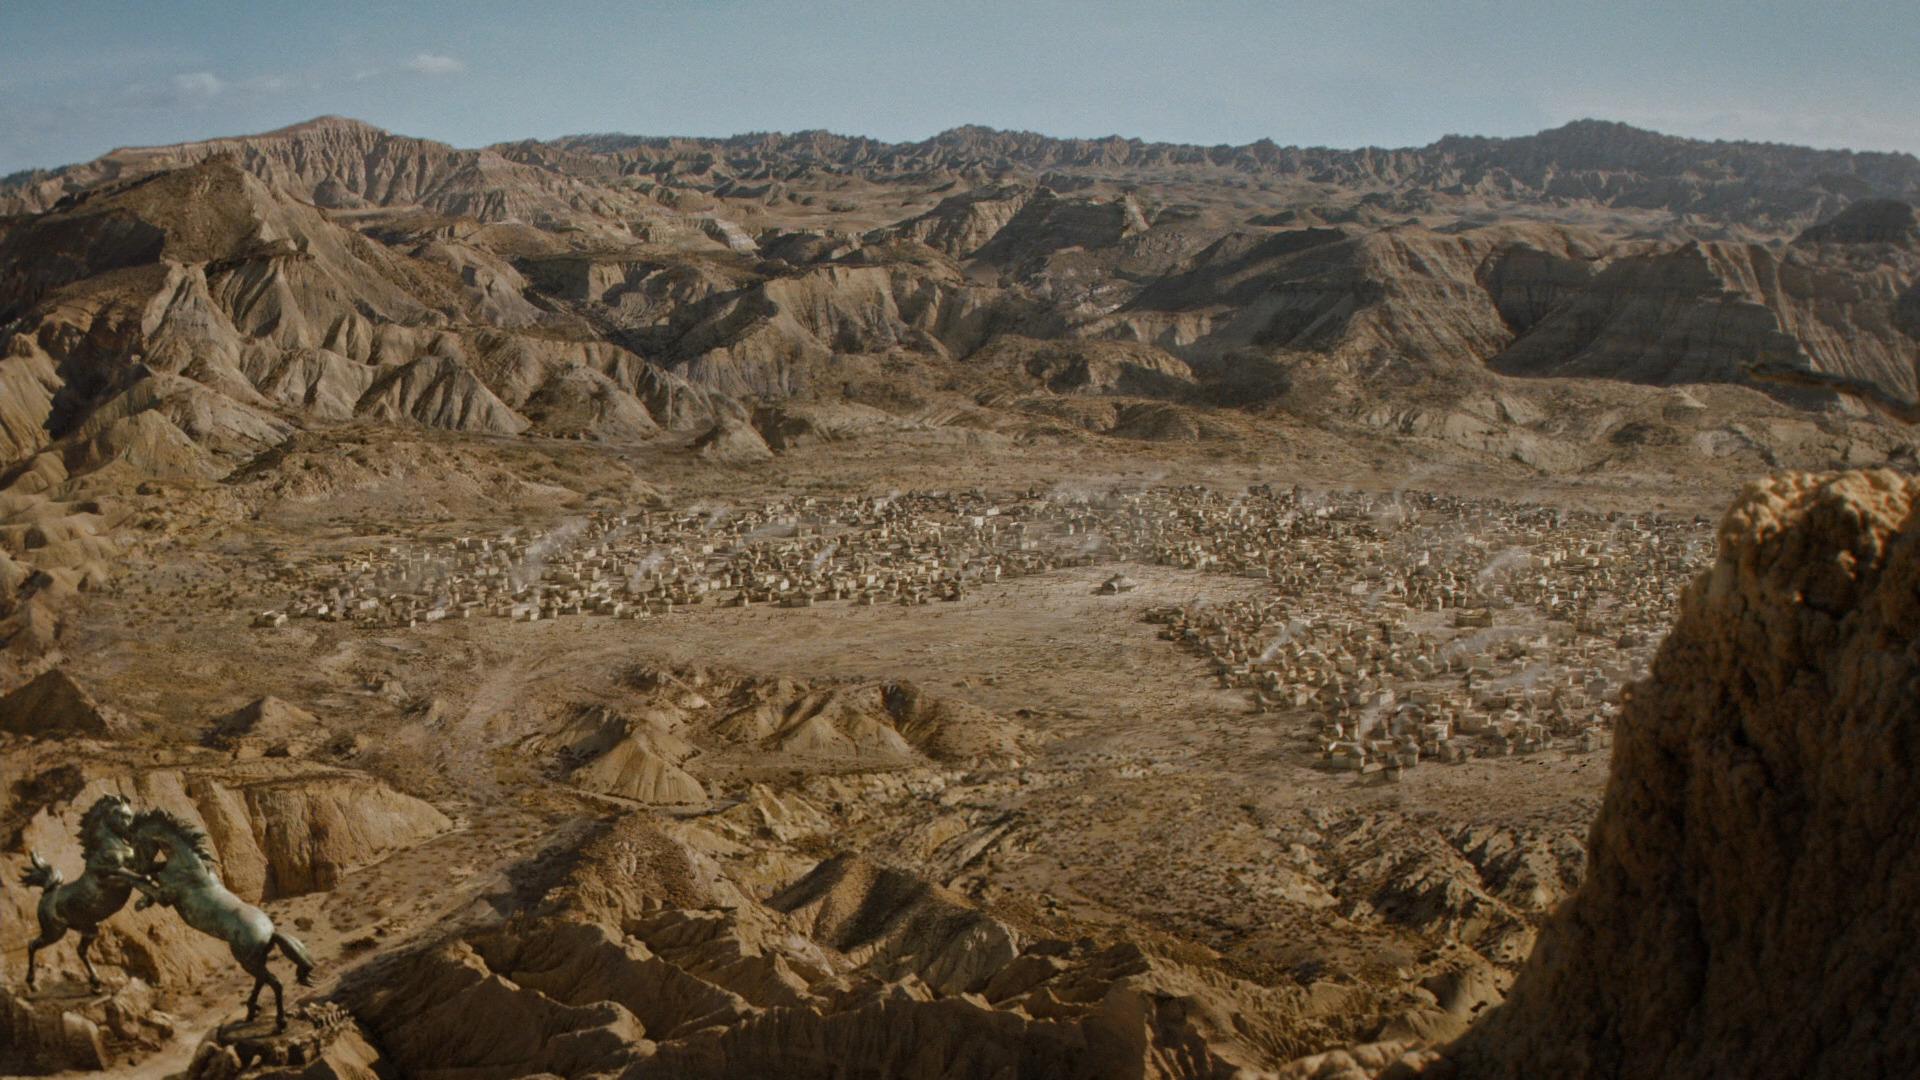 Archivo:Vaes Dothrak HBO.jpeg